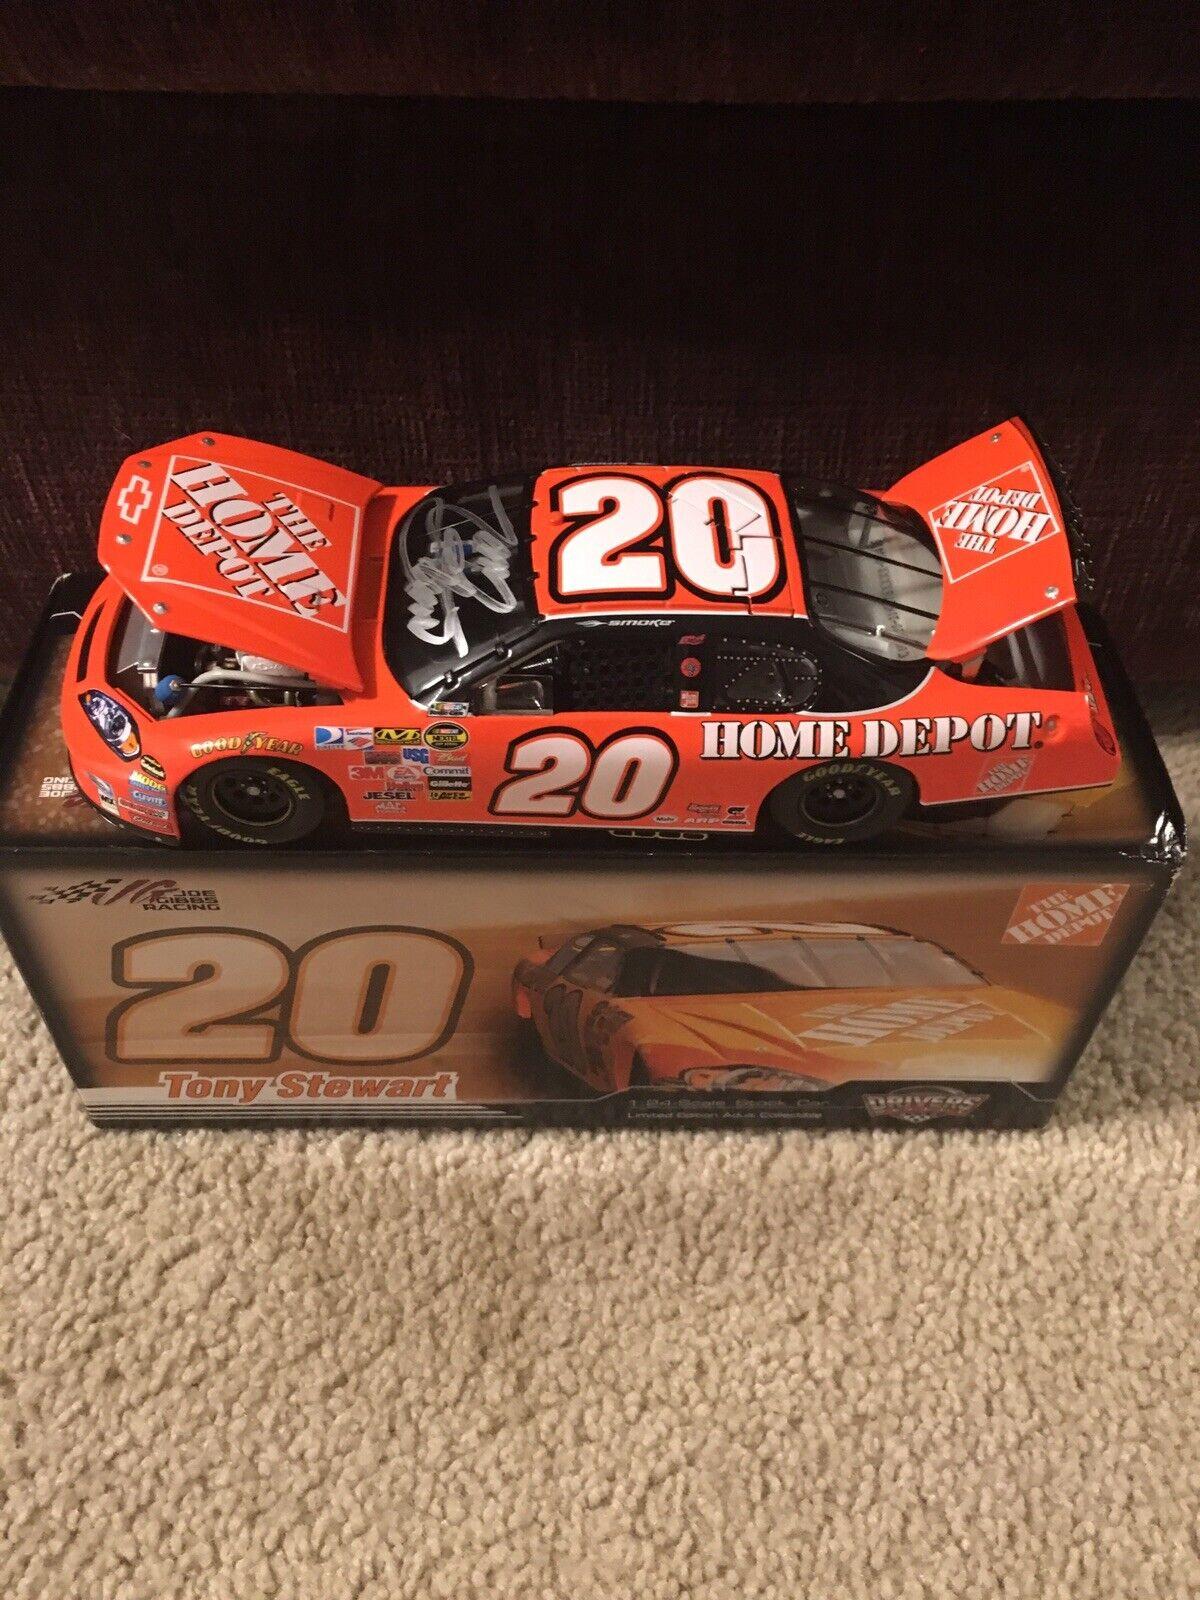 Tony Stewart signé dédicacé 2007 Action 1 24 Home Depot